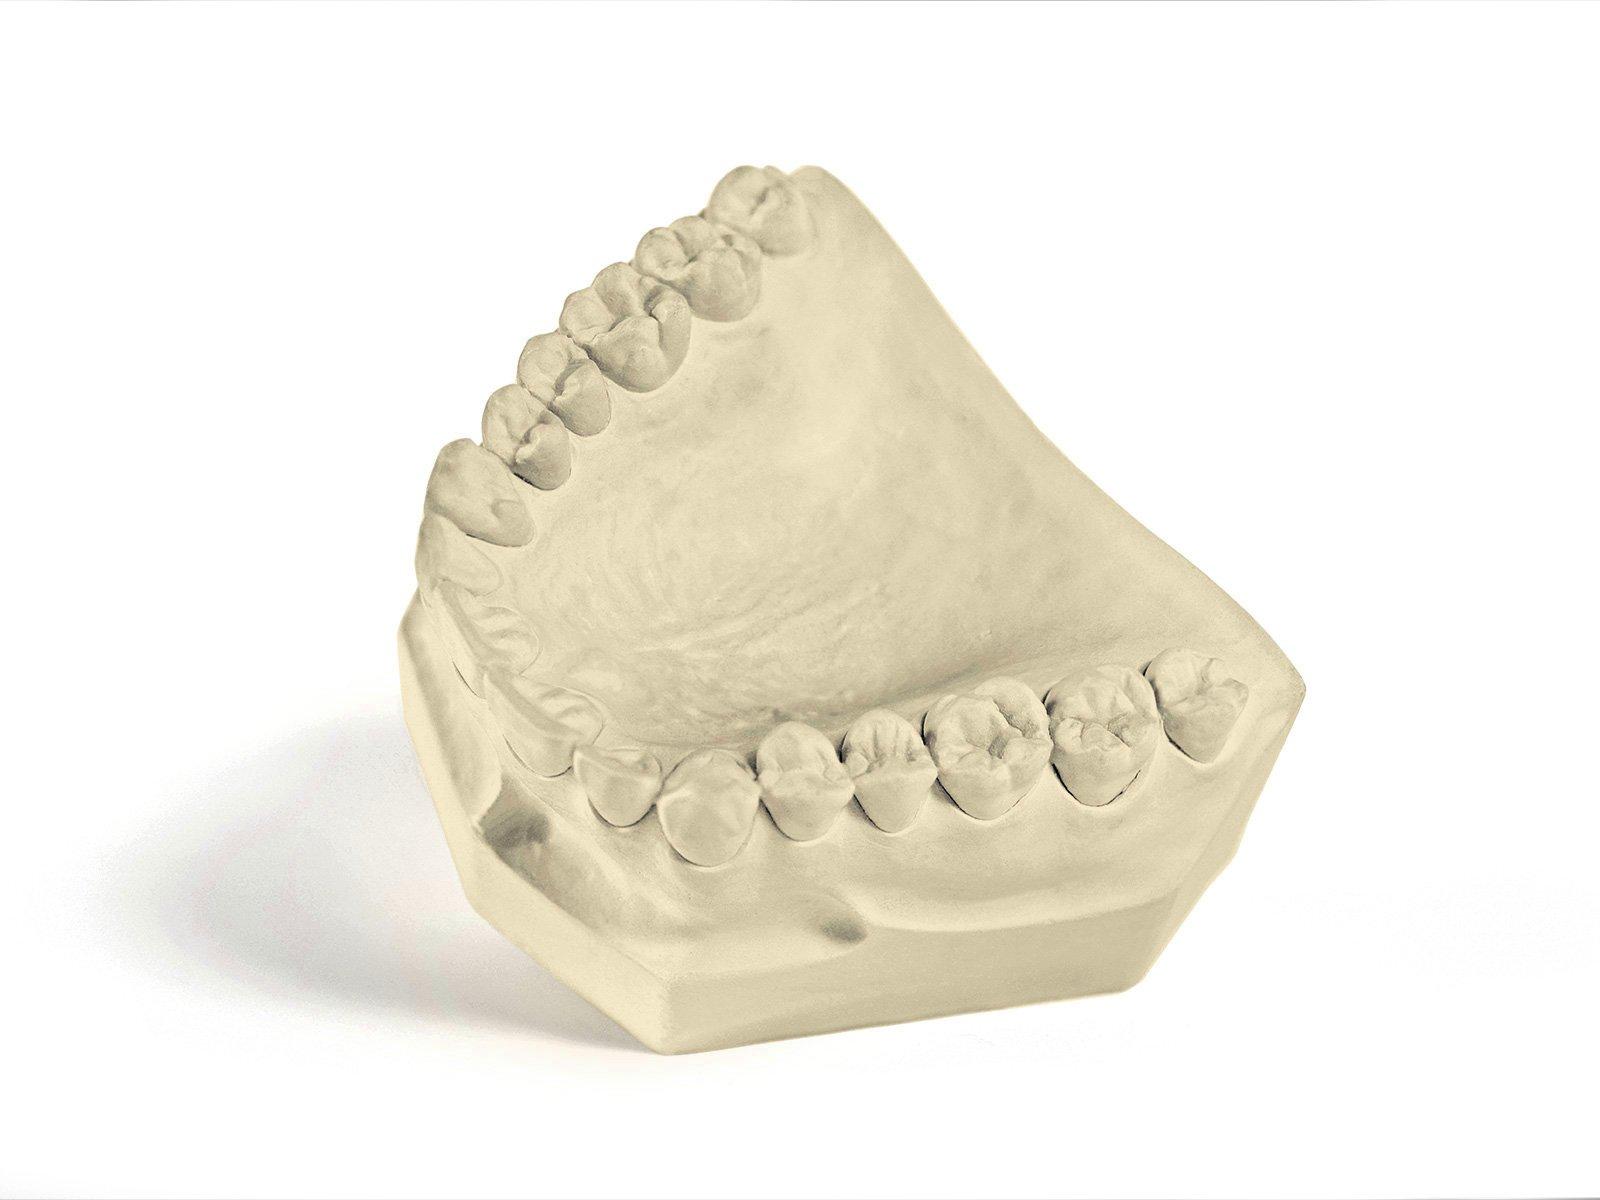 Garreco 1031025 Dental Tecstone FL, Type III Gypsum Base Stone, 25 lb Carton, Buff